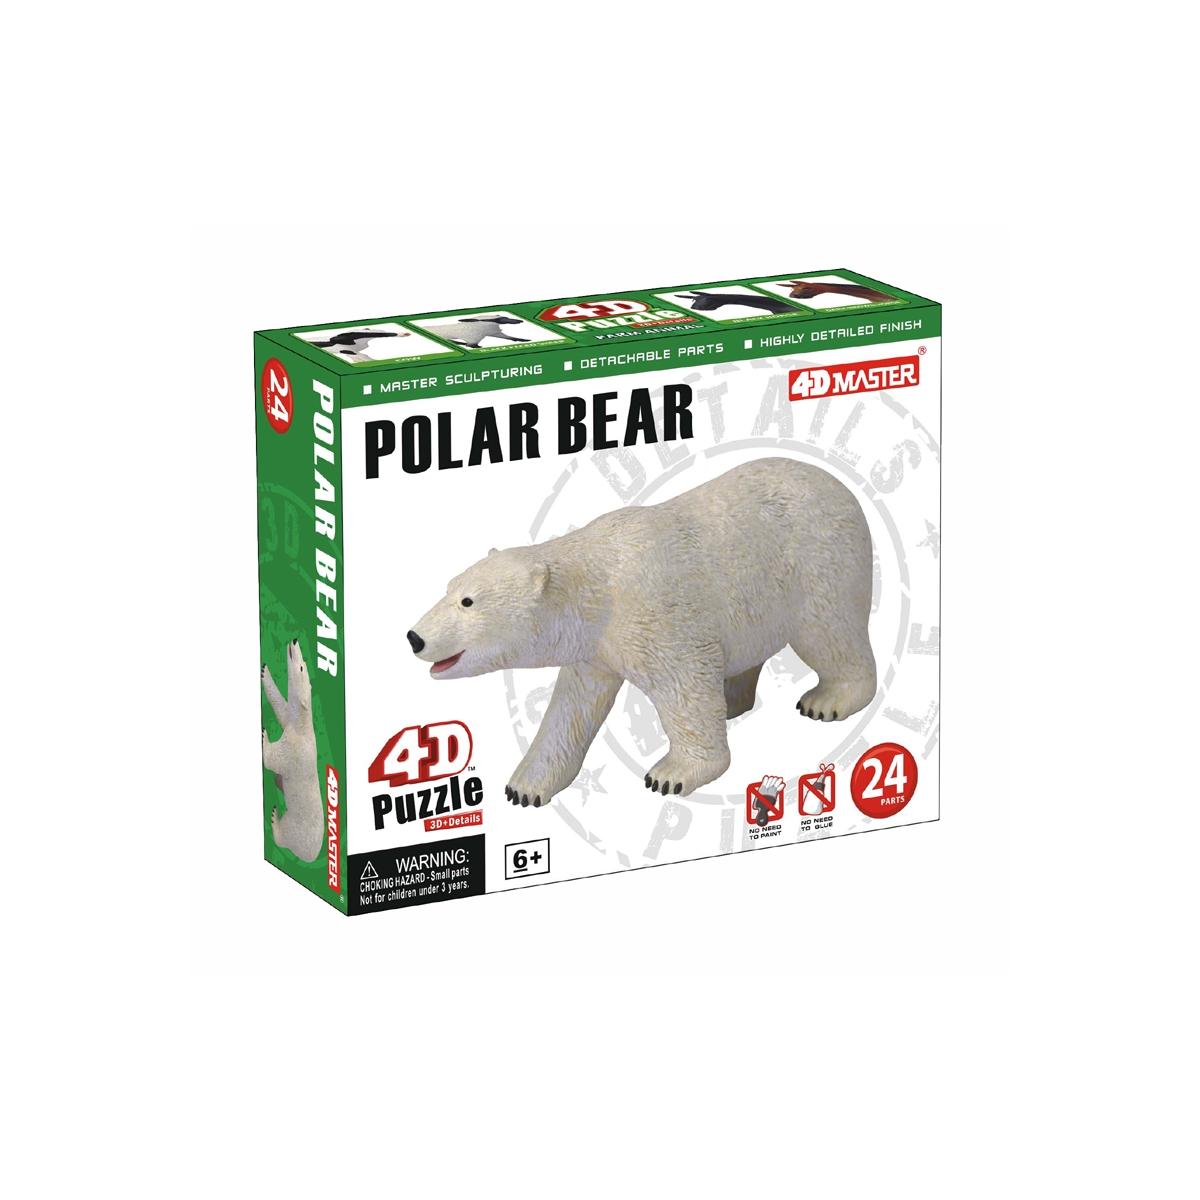 Polar Bear Model Puzzle